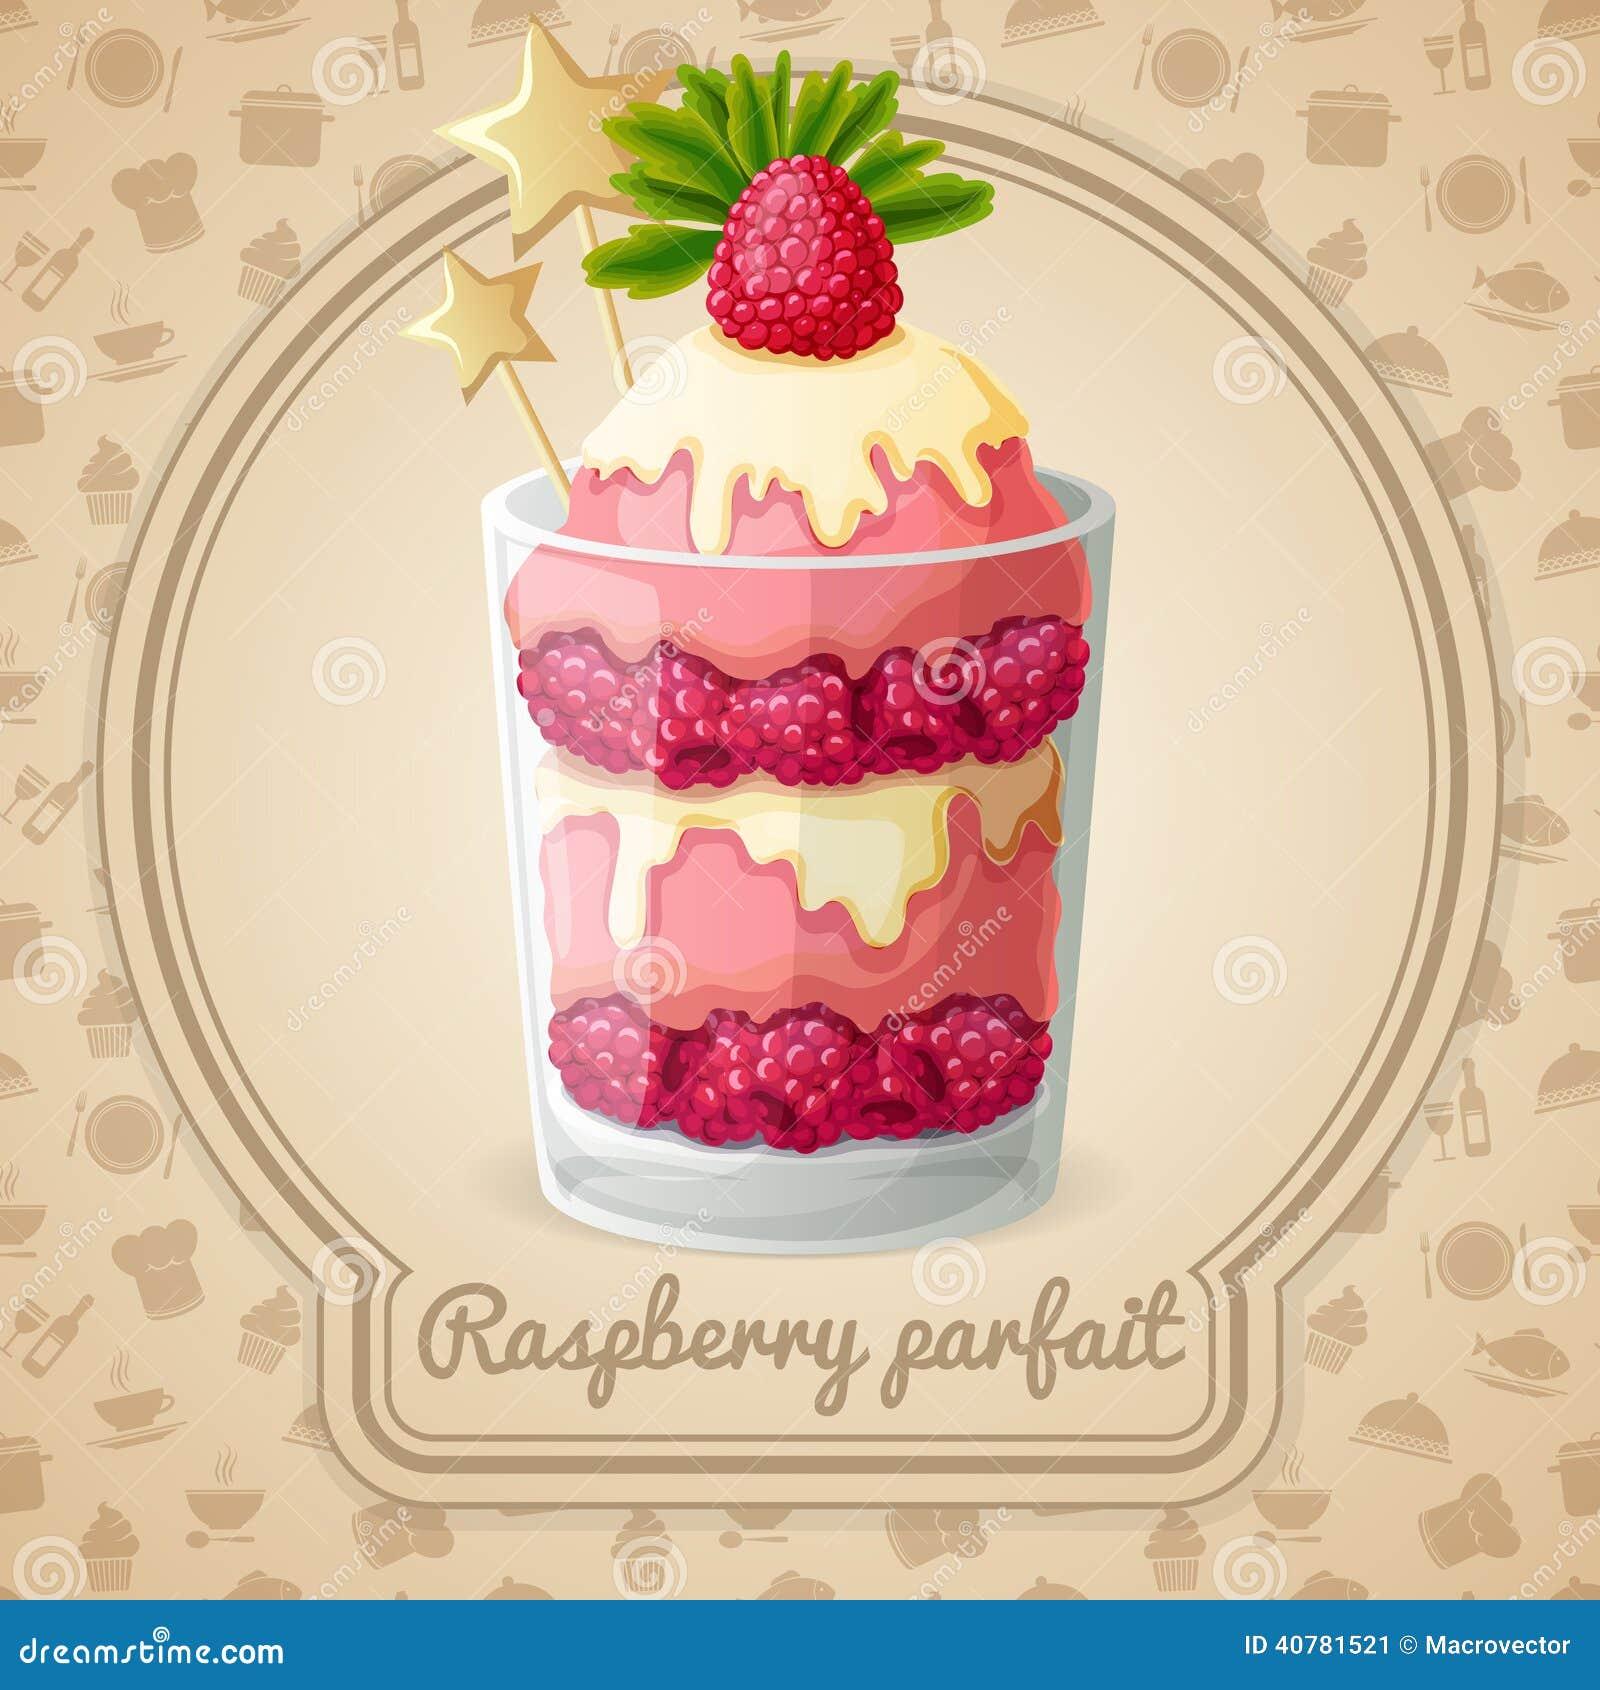 Raspberry Parfait Emblem Stock Vector. Image Of Icon